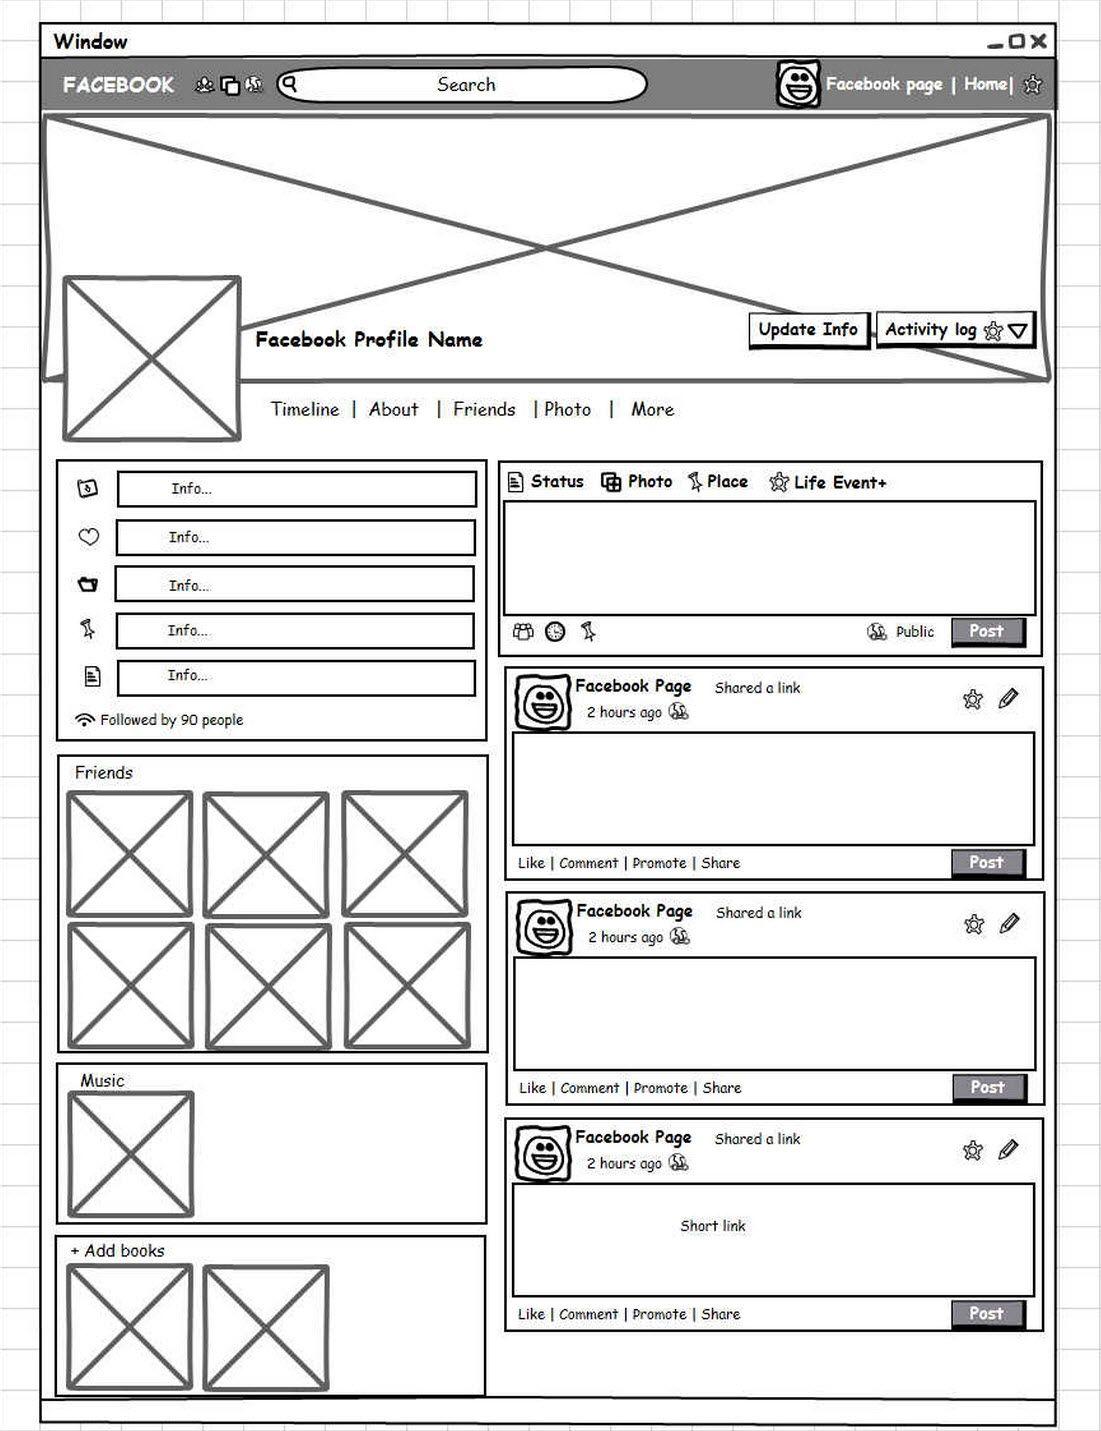 Social Network Profile Page Wireframe Wireframe Wireframe Mockup Web Design